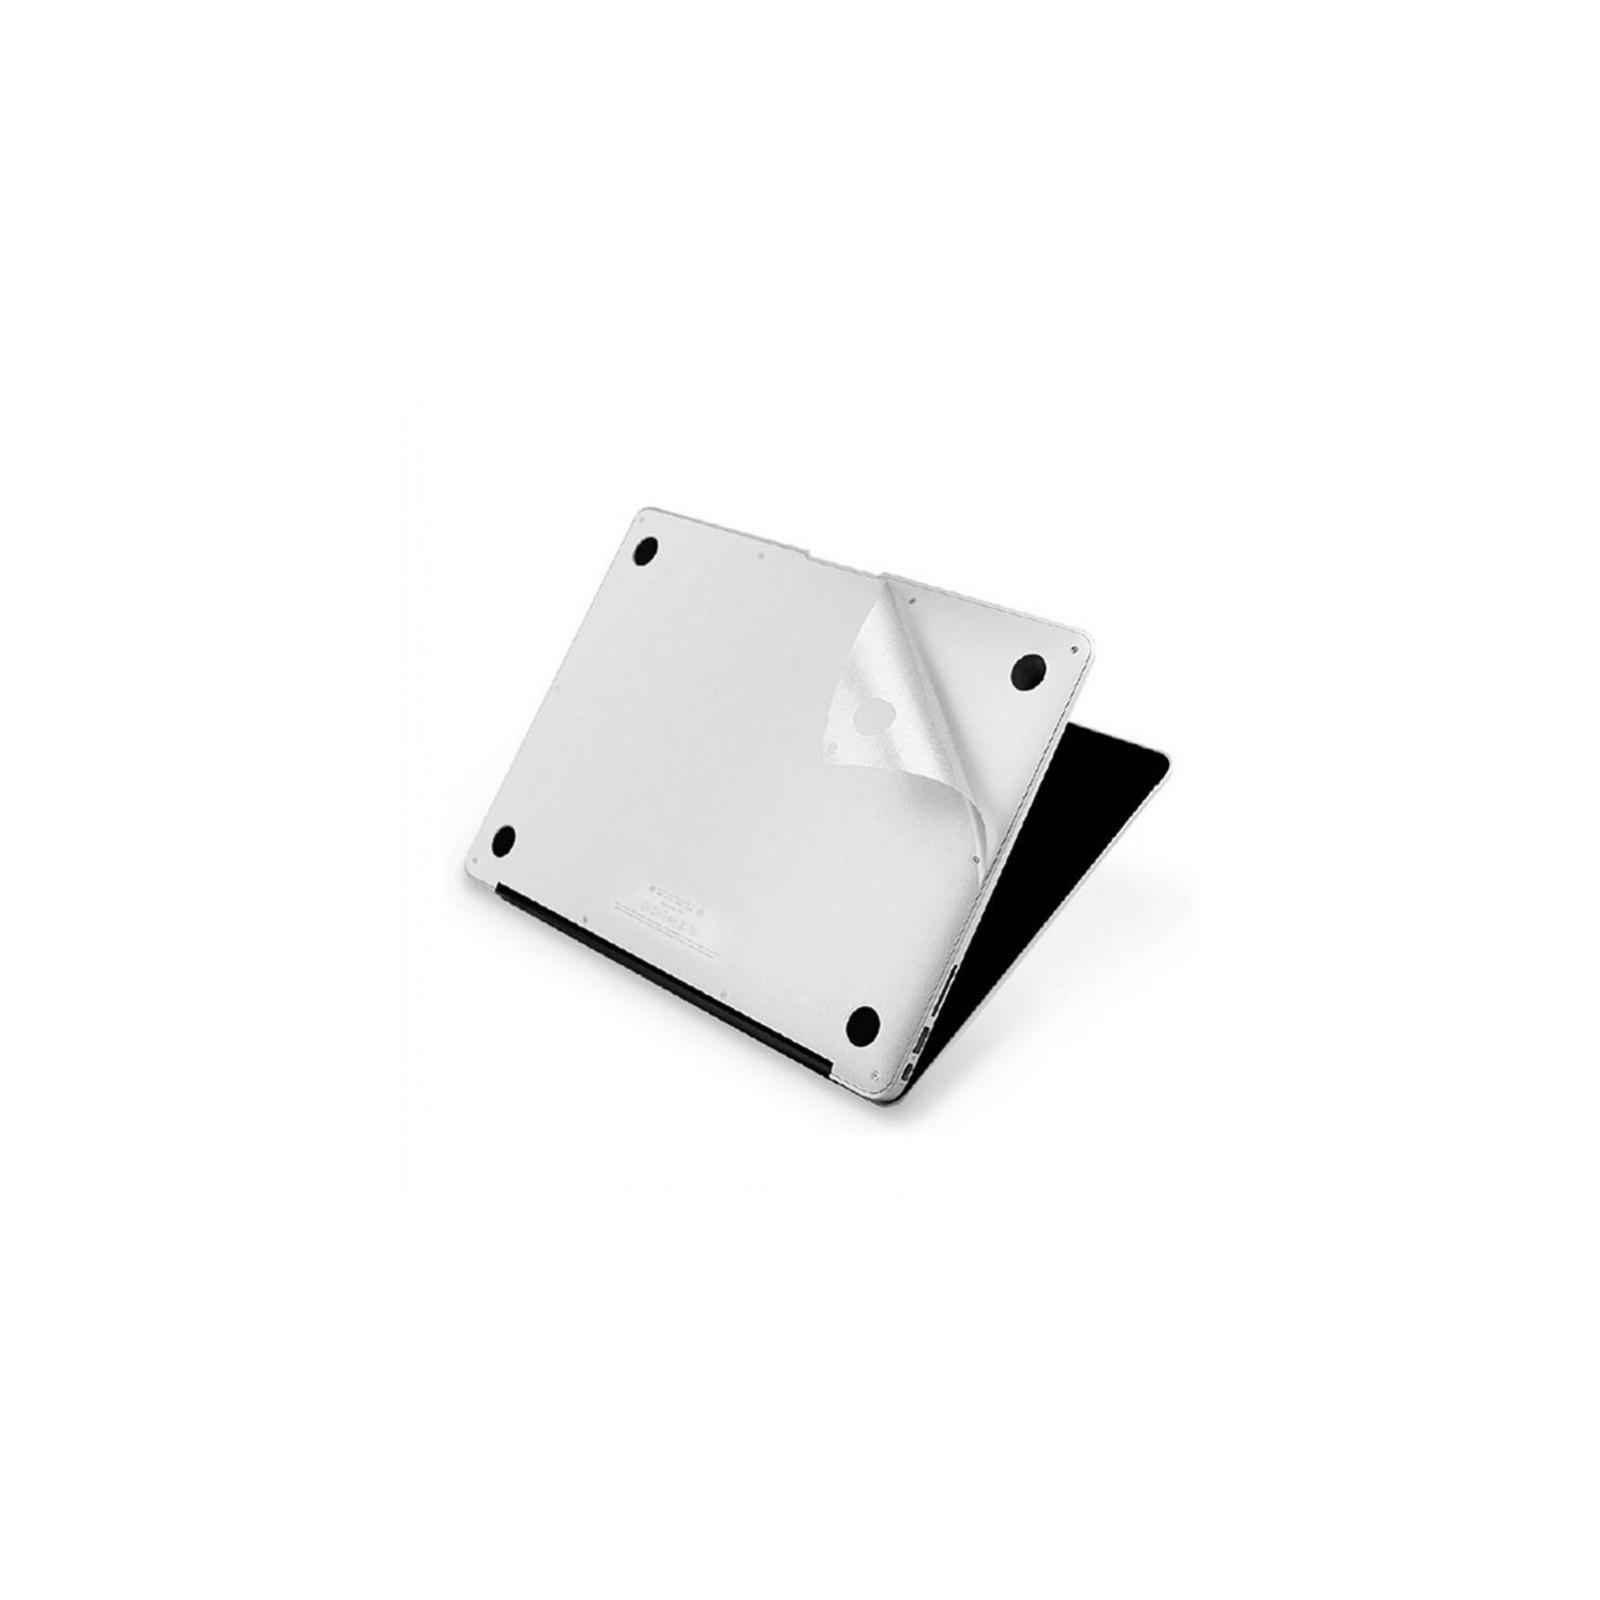 Пленка защитная JCPAL 3 in 1 set для MacBook Air 11 (JCP2043) изображение 4